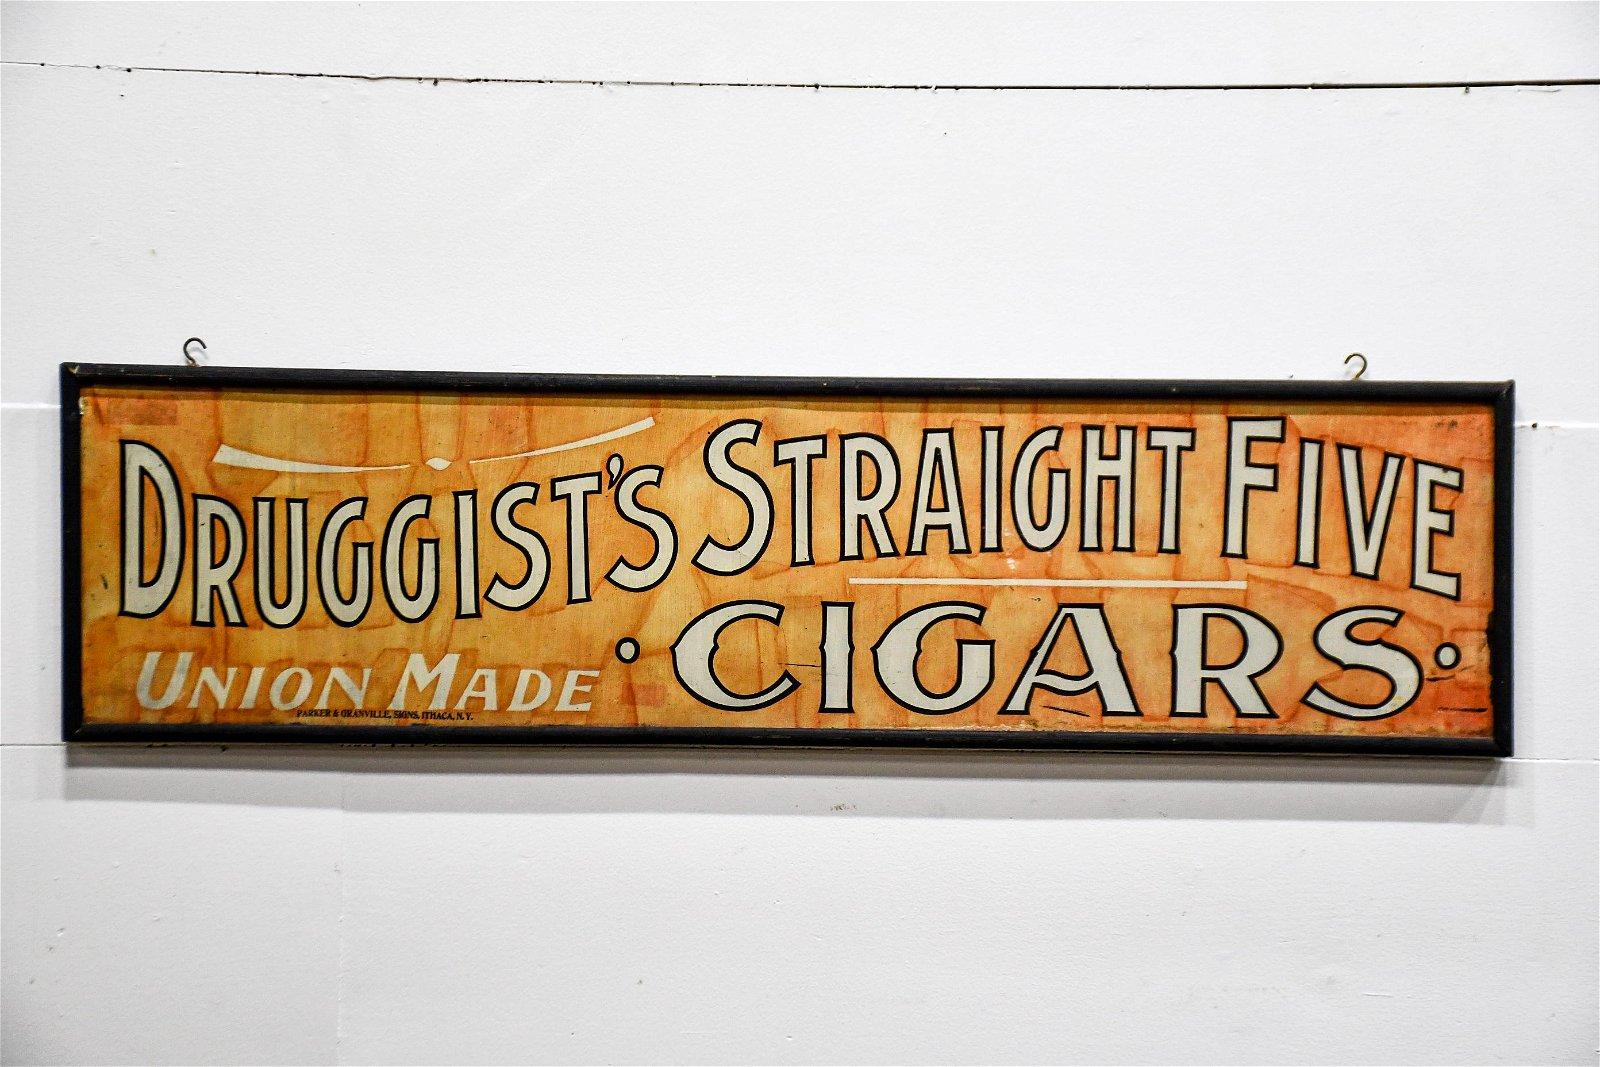 Druggist's Straight Five Cigars Sign metal / wood